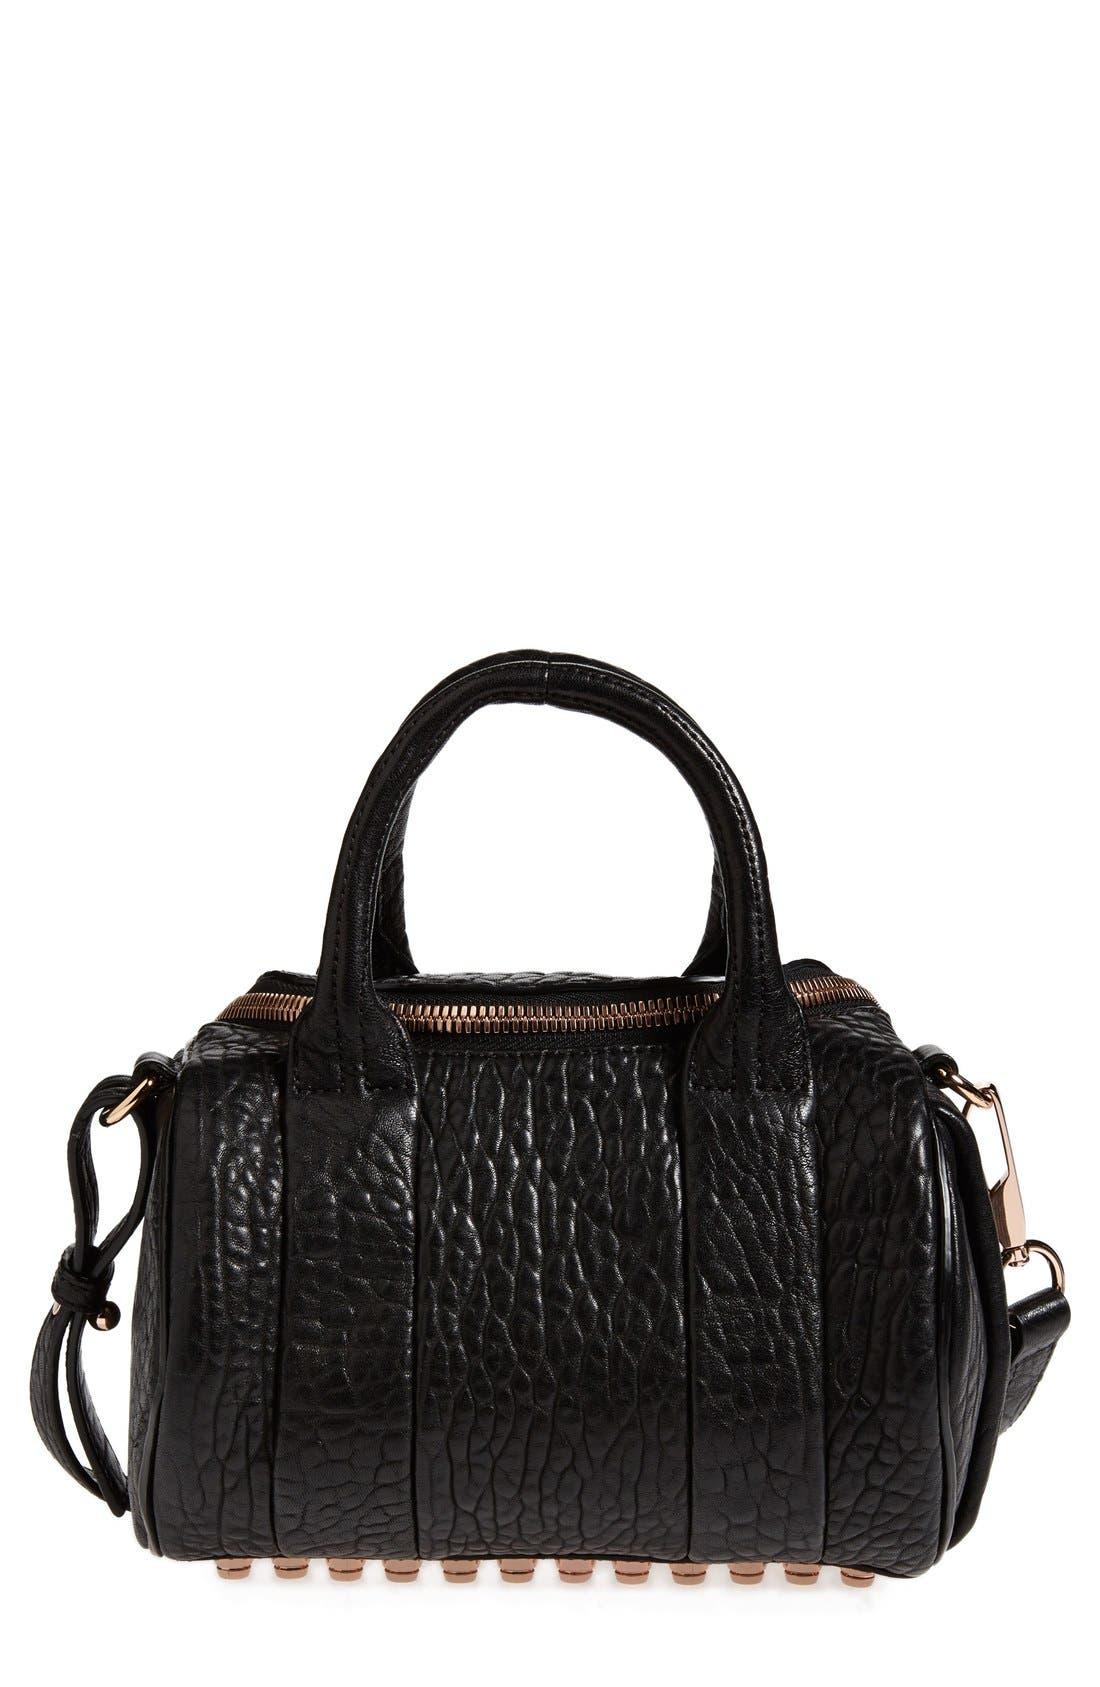 'Mini Rockie - Rose Gold' Leather Crossbody Satchel, Main, color, BLACK